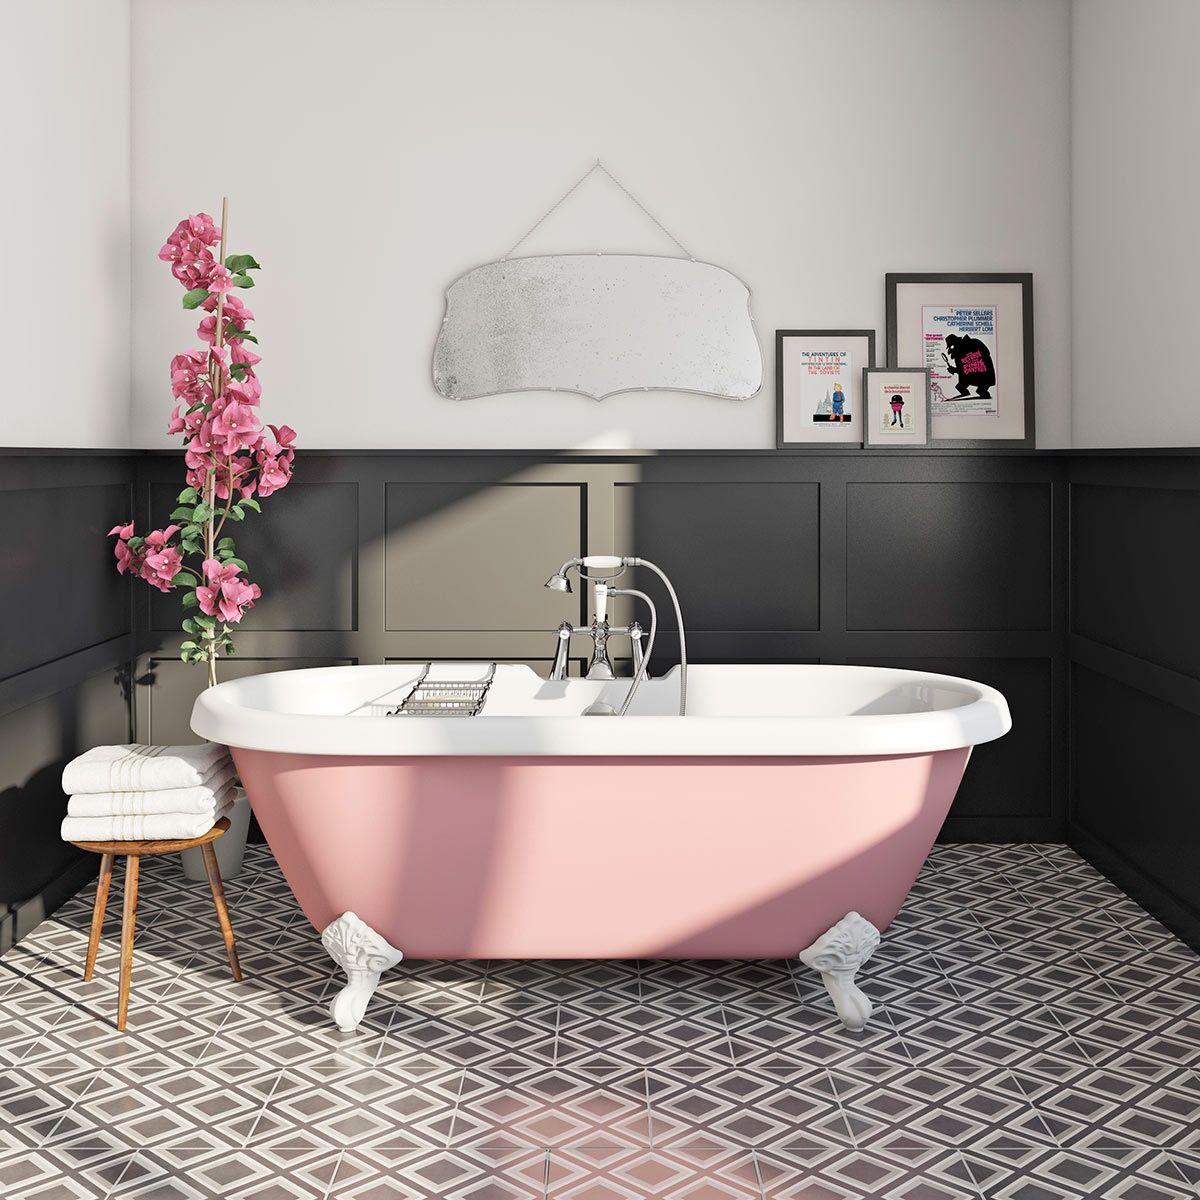 cada clawfoot baie în stil retro